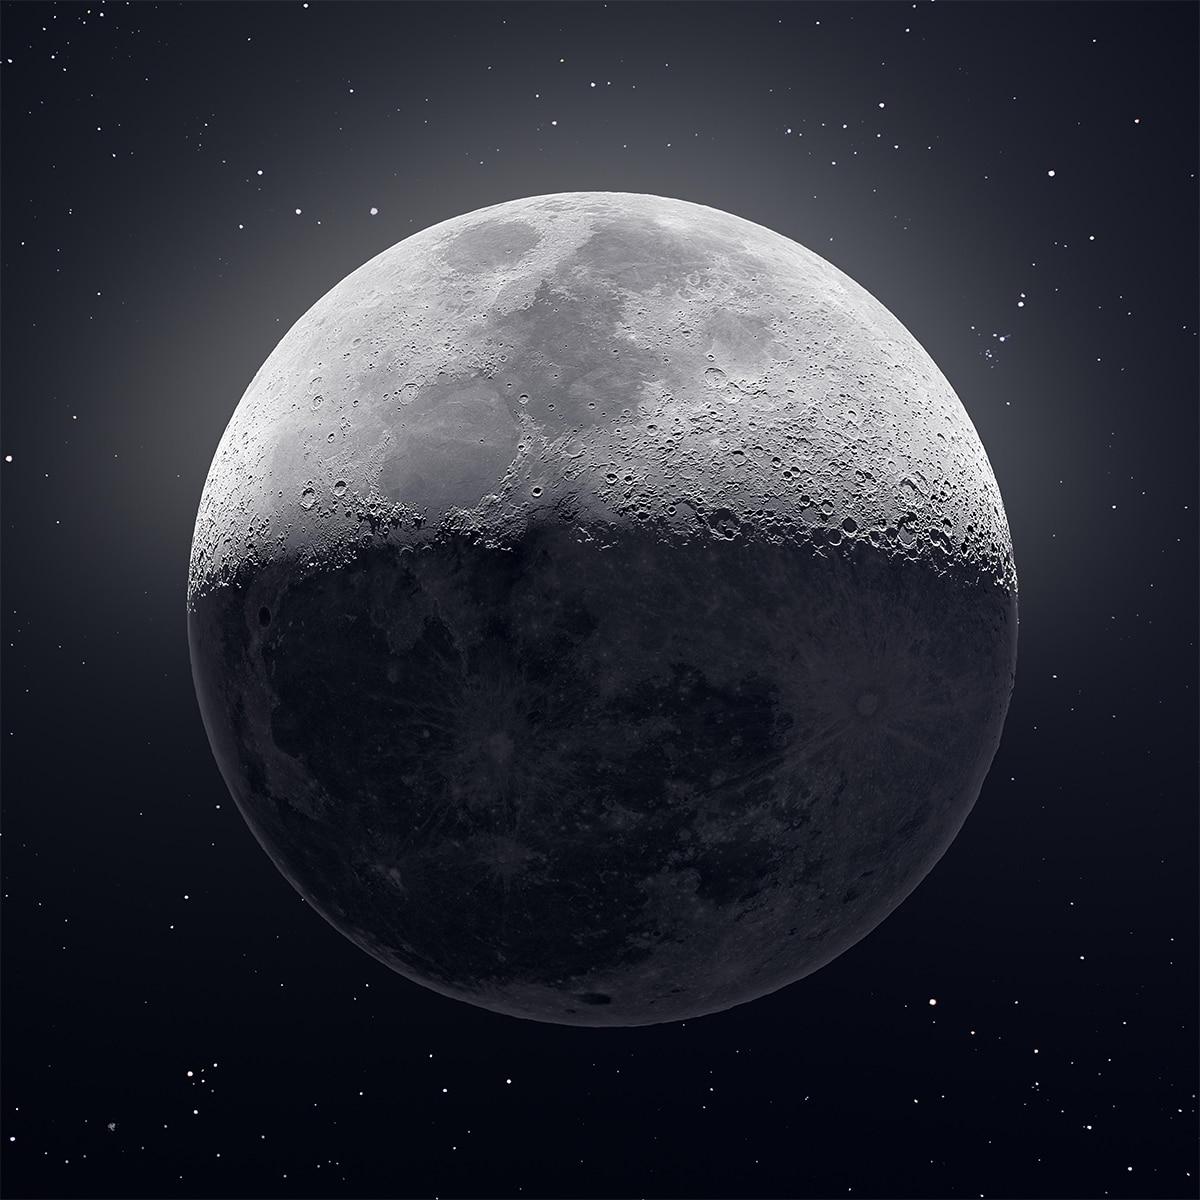 lunar-photogaphy-andrew-mccarthy-2